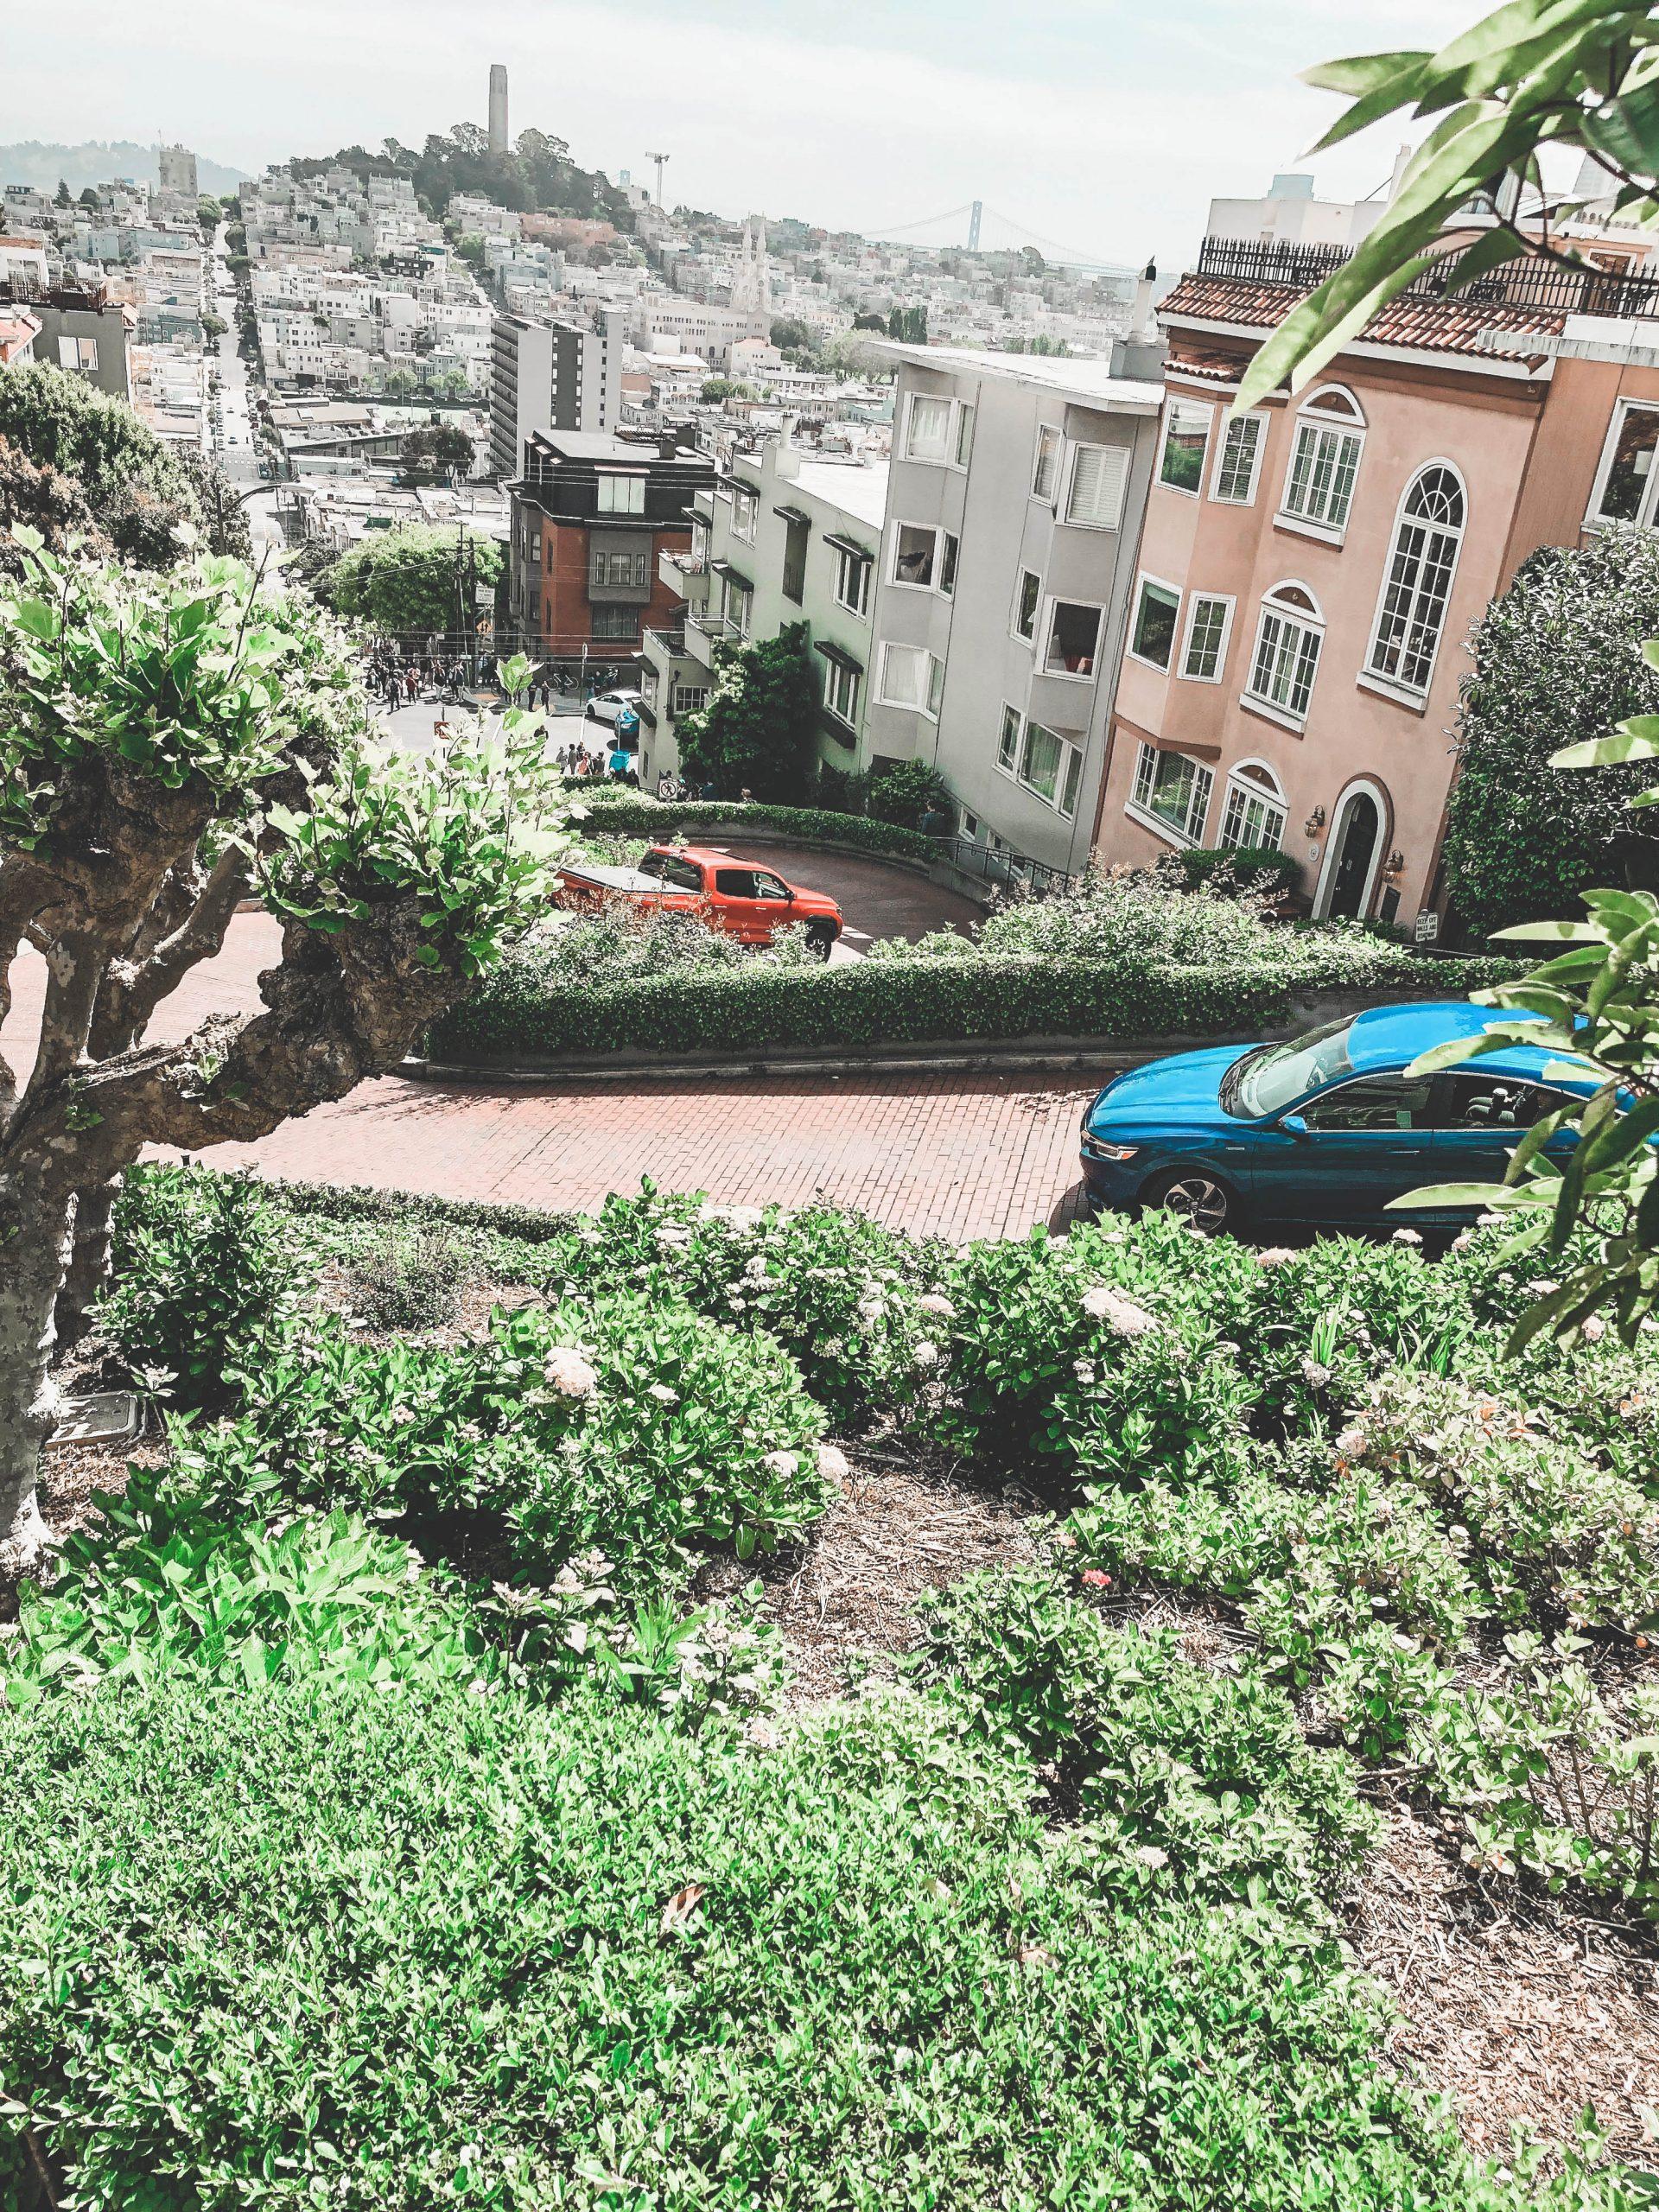 Lombard Street, vue du haut